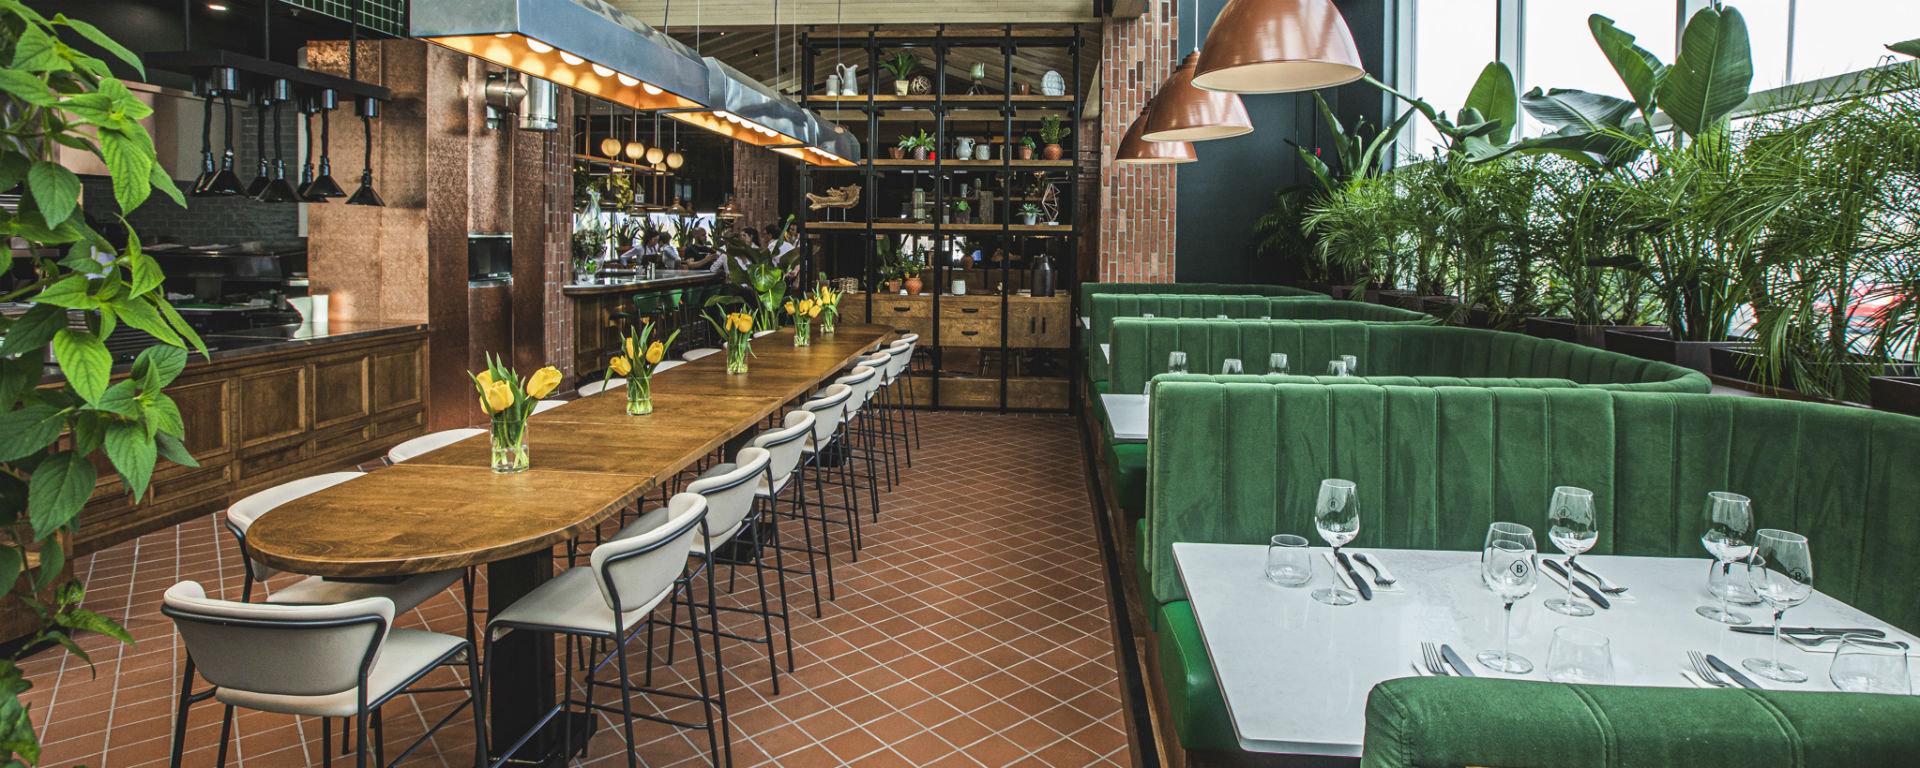 Restaurant Les Botanistes